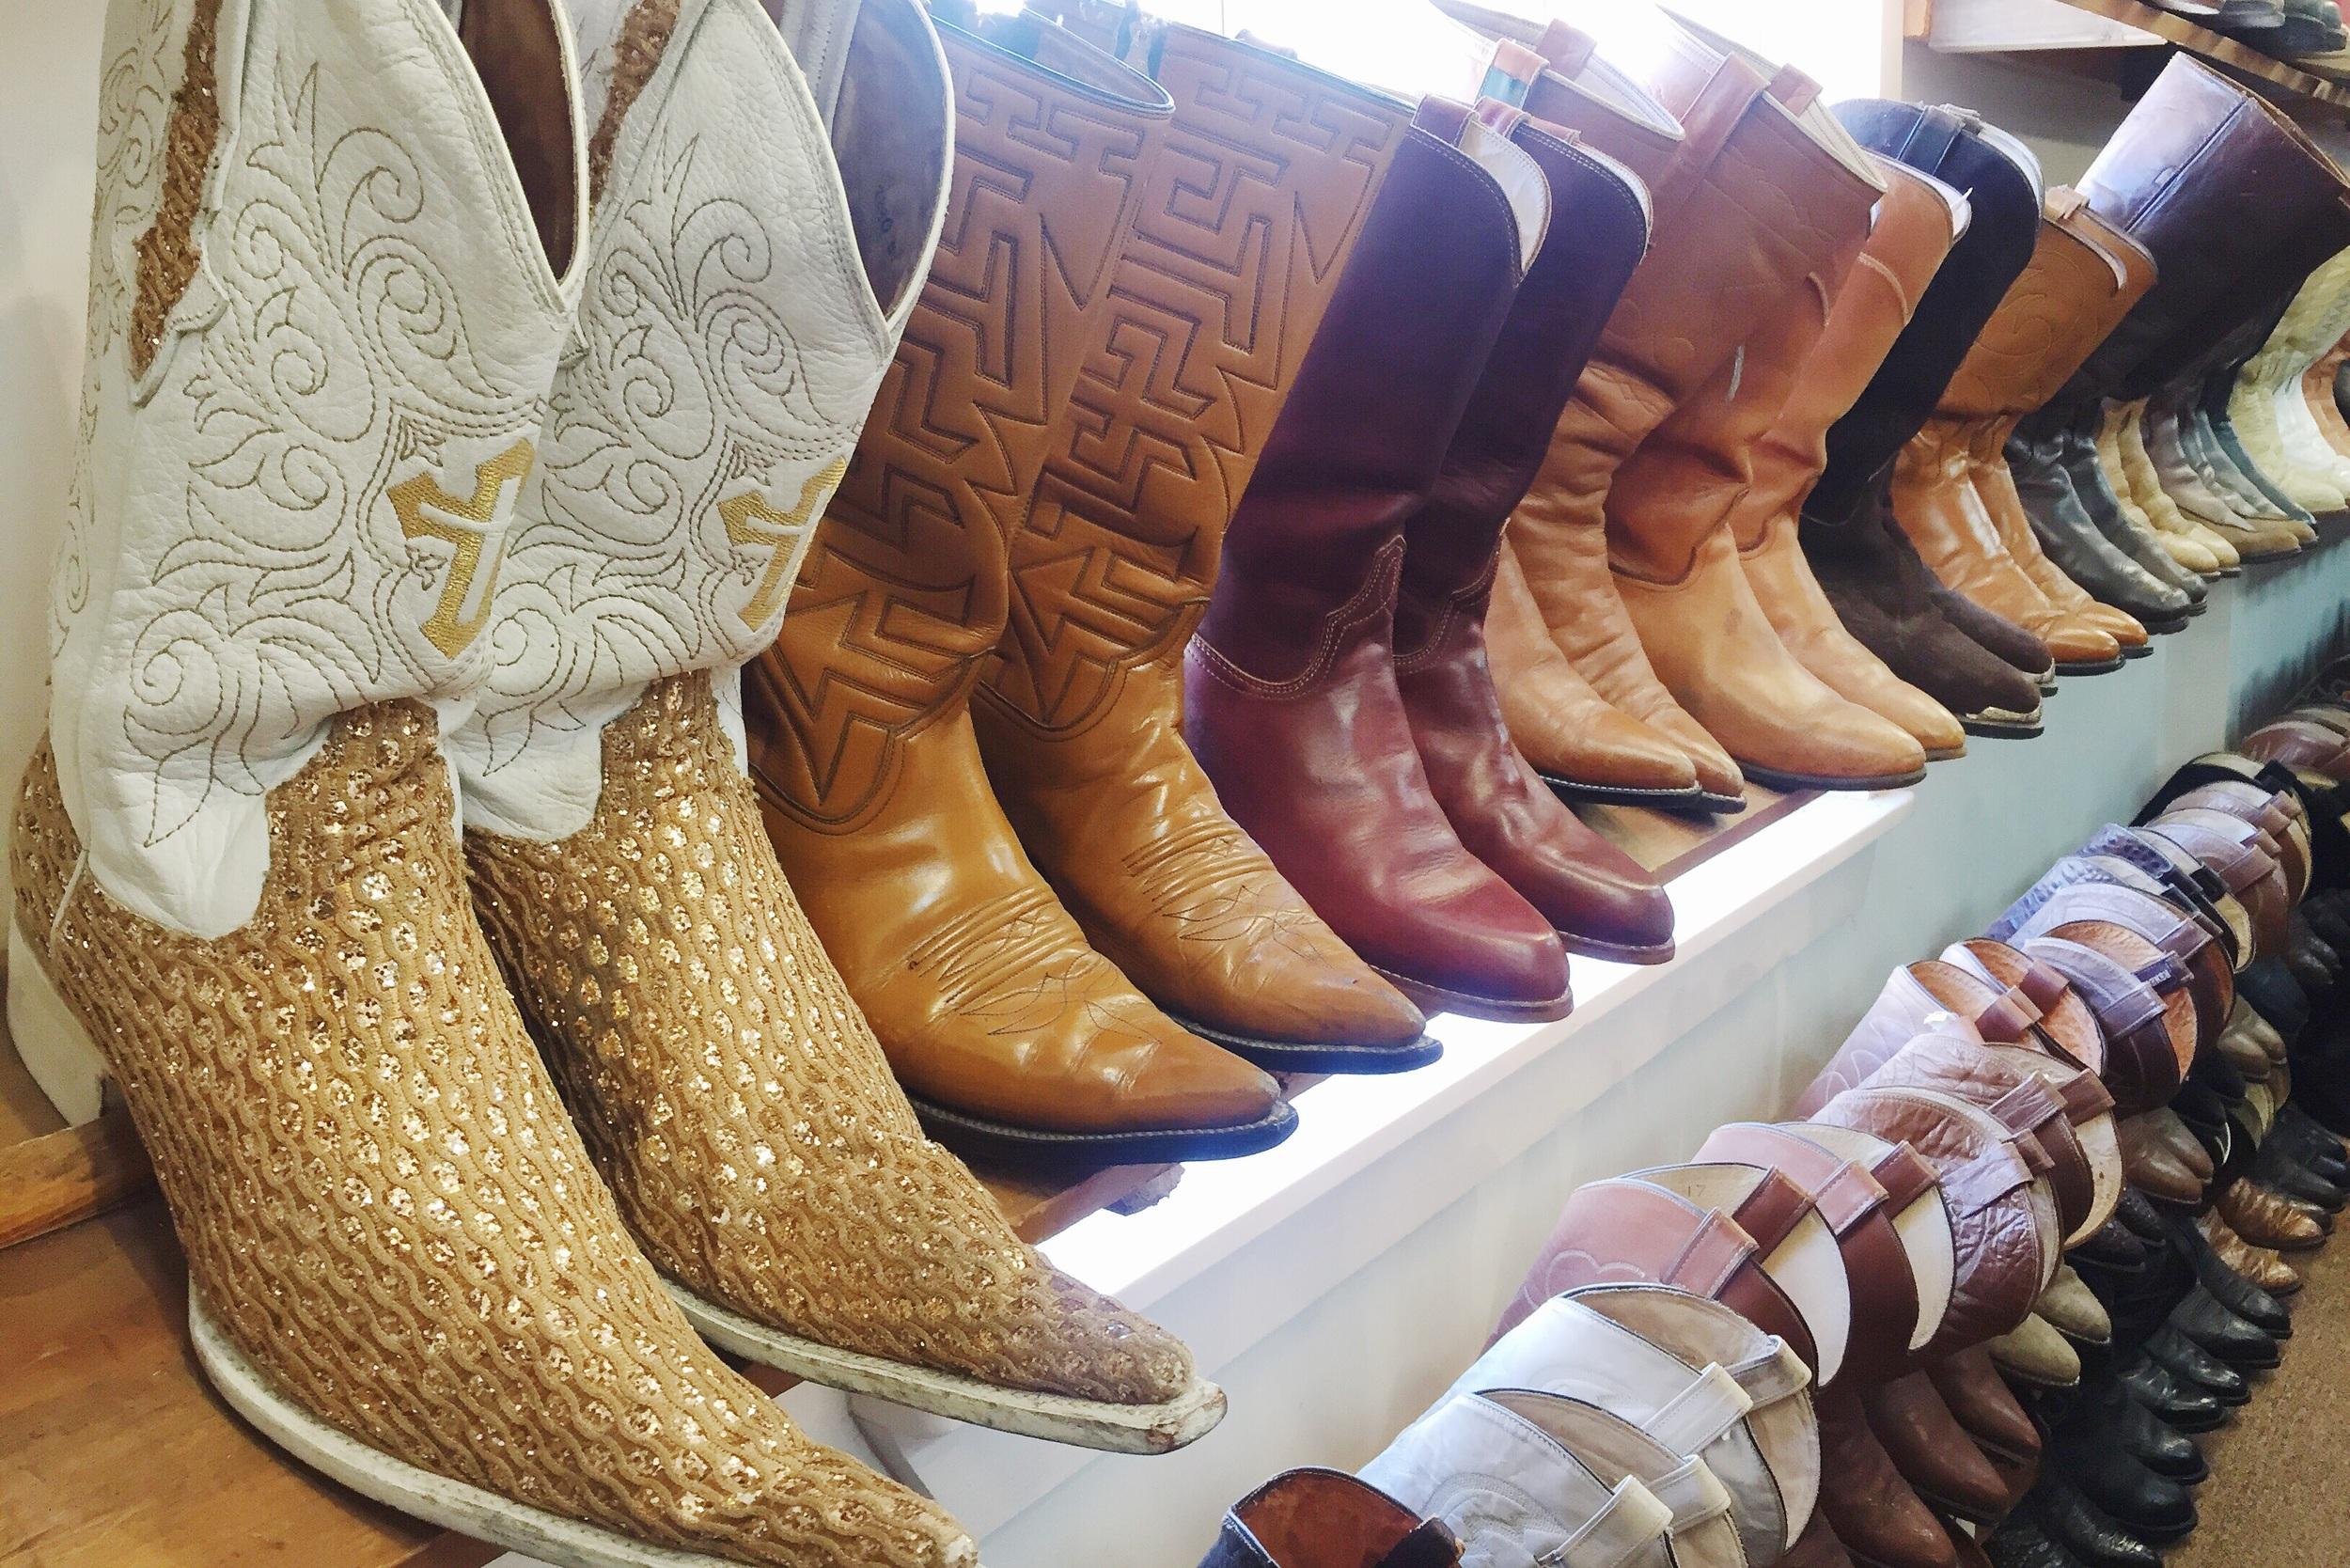 Vintage at Kowboyz, Santa Fe